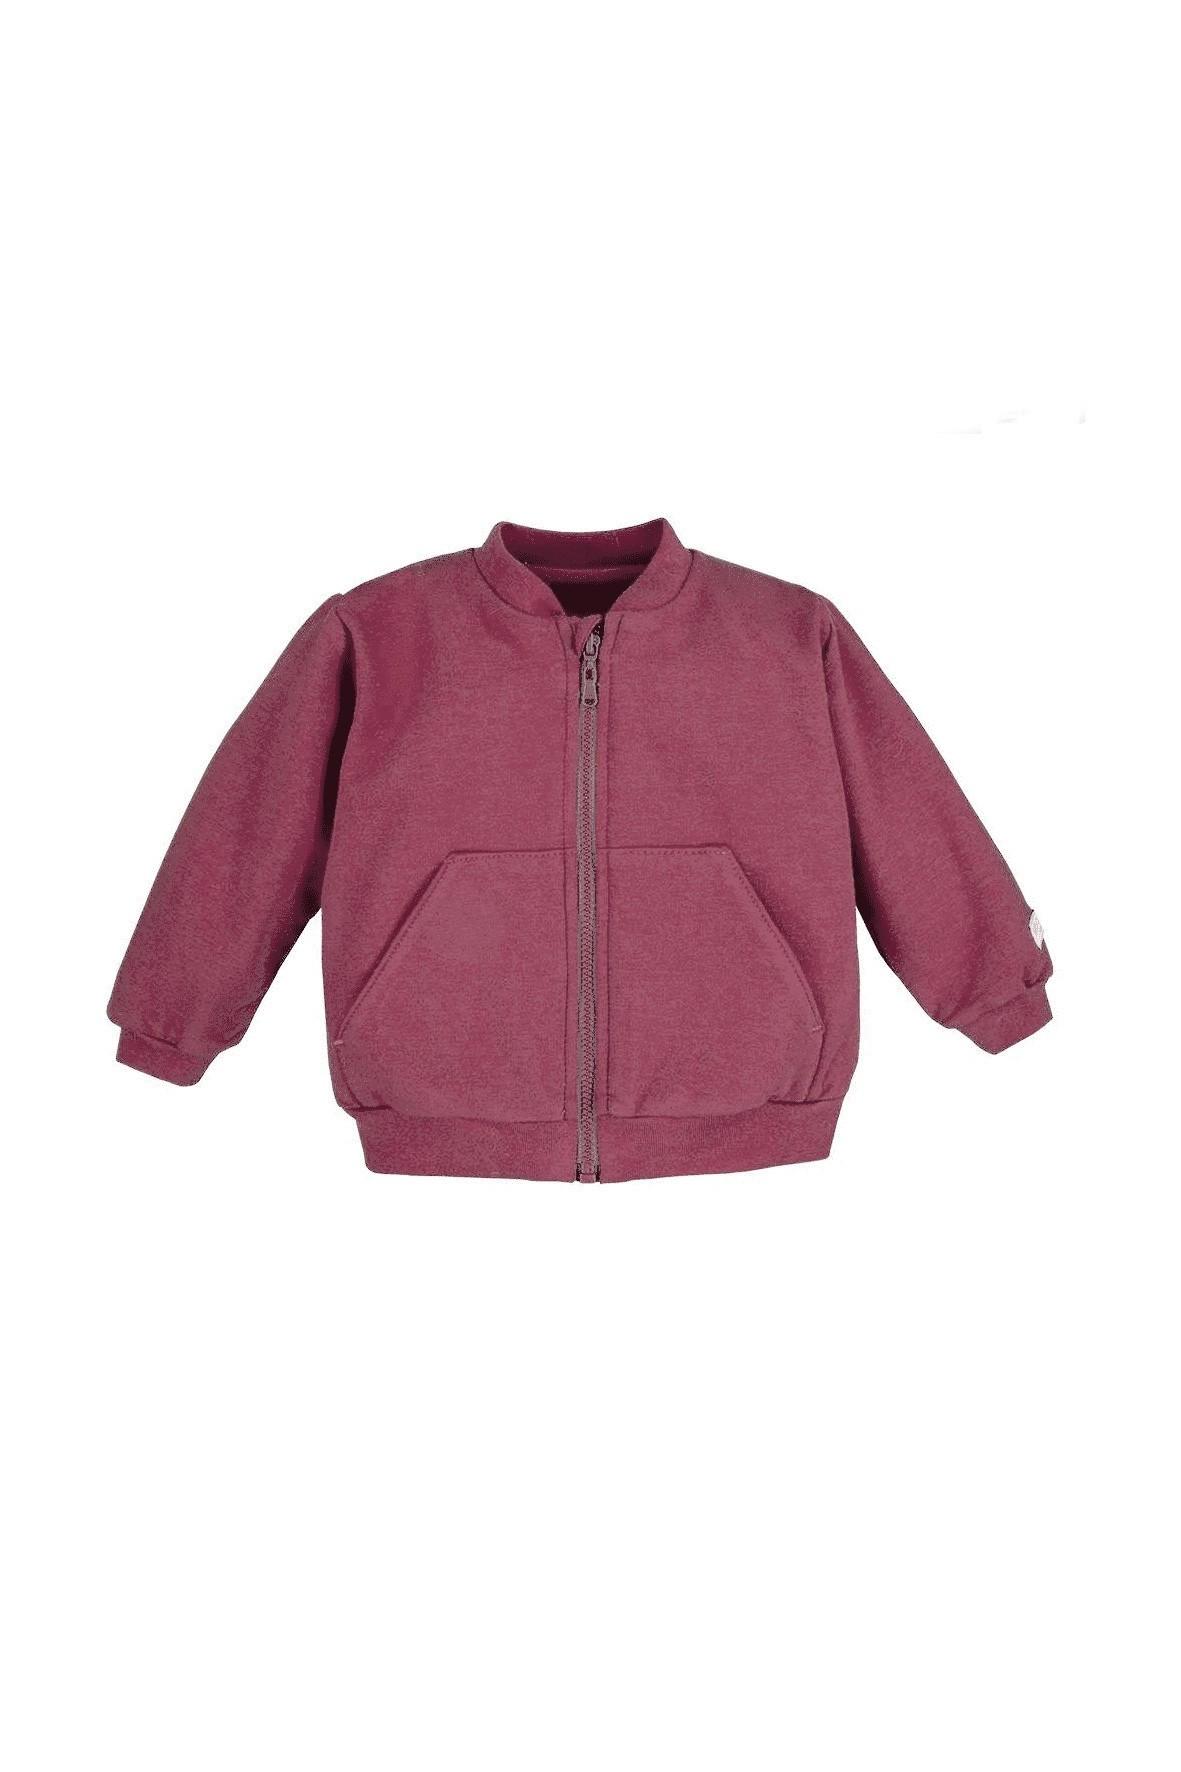 Bawełniana bluza bomberka - borodowa